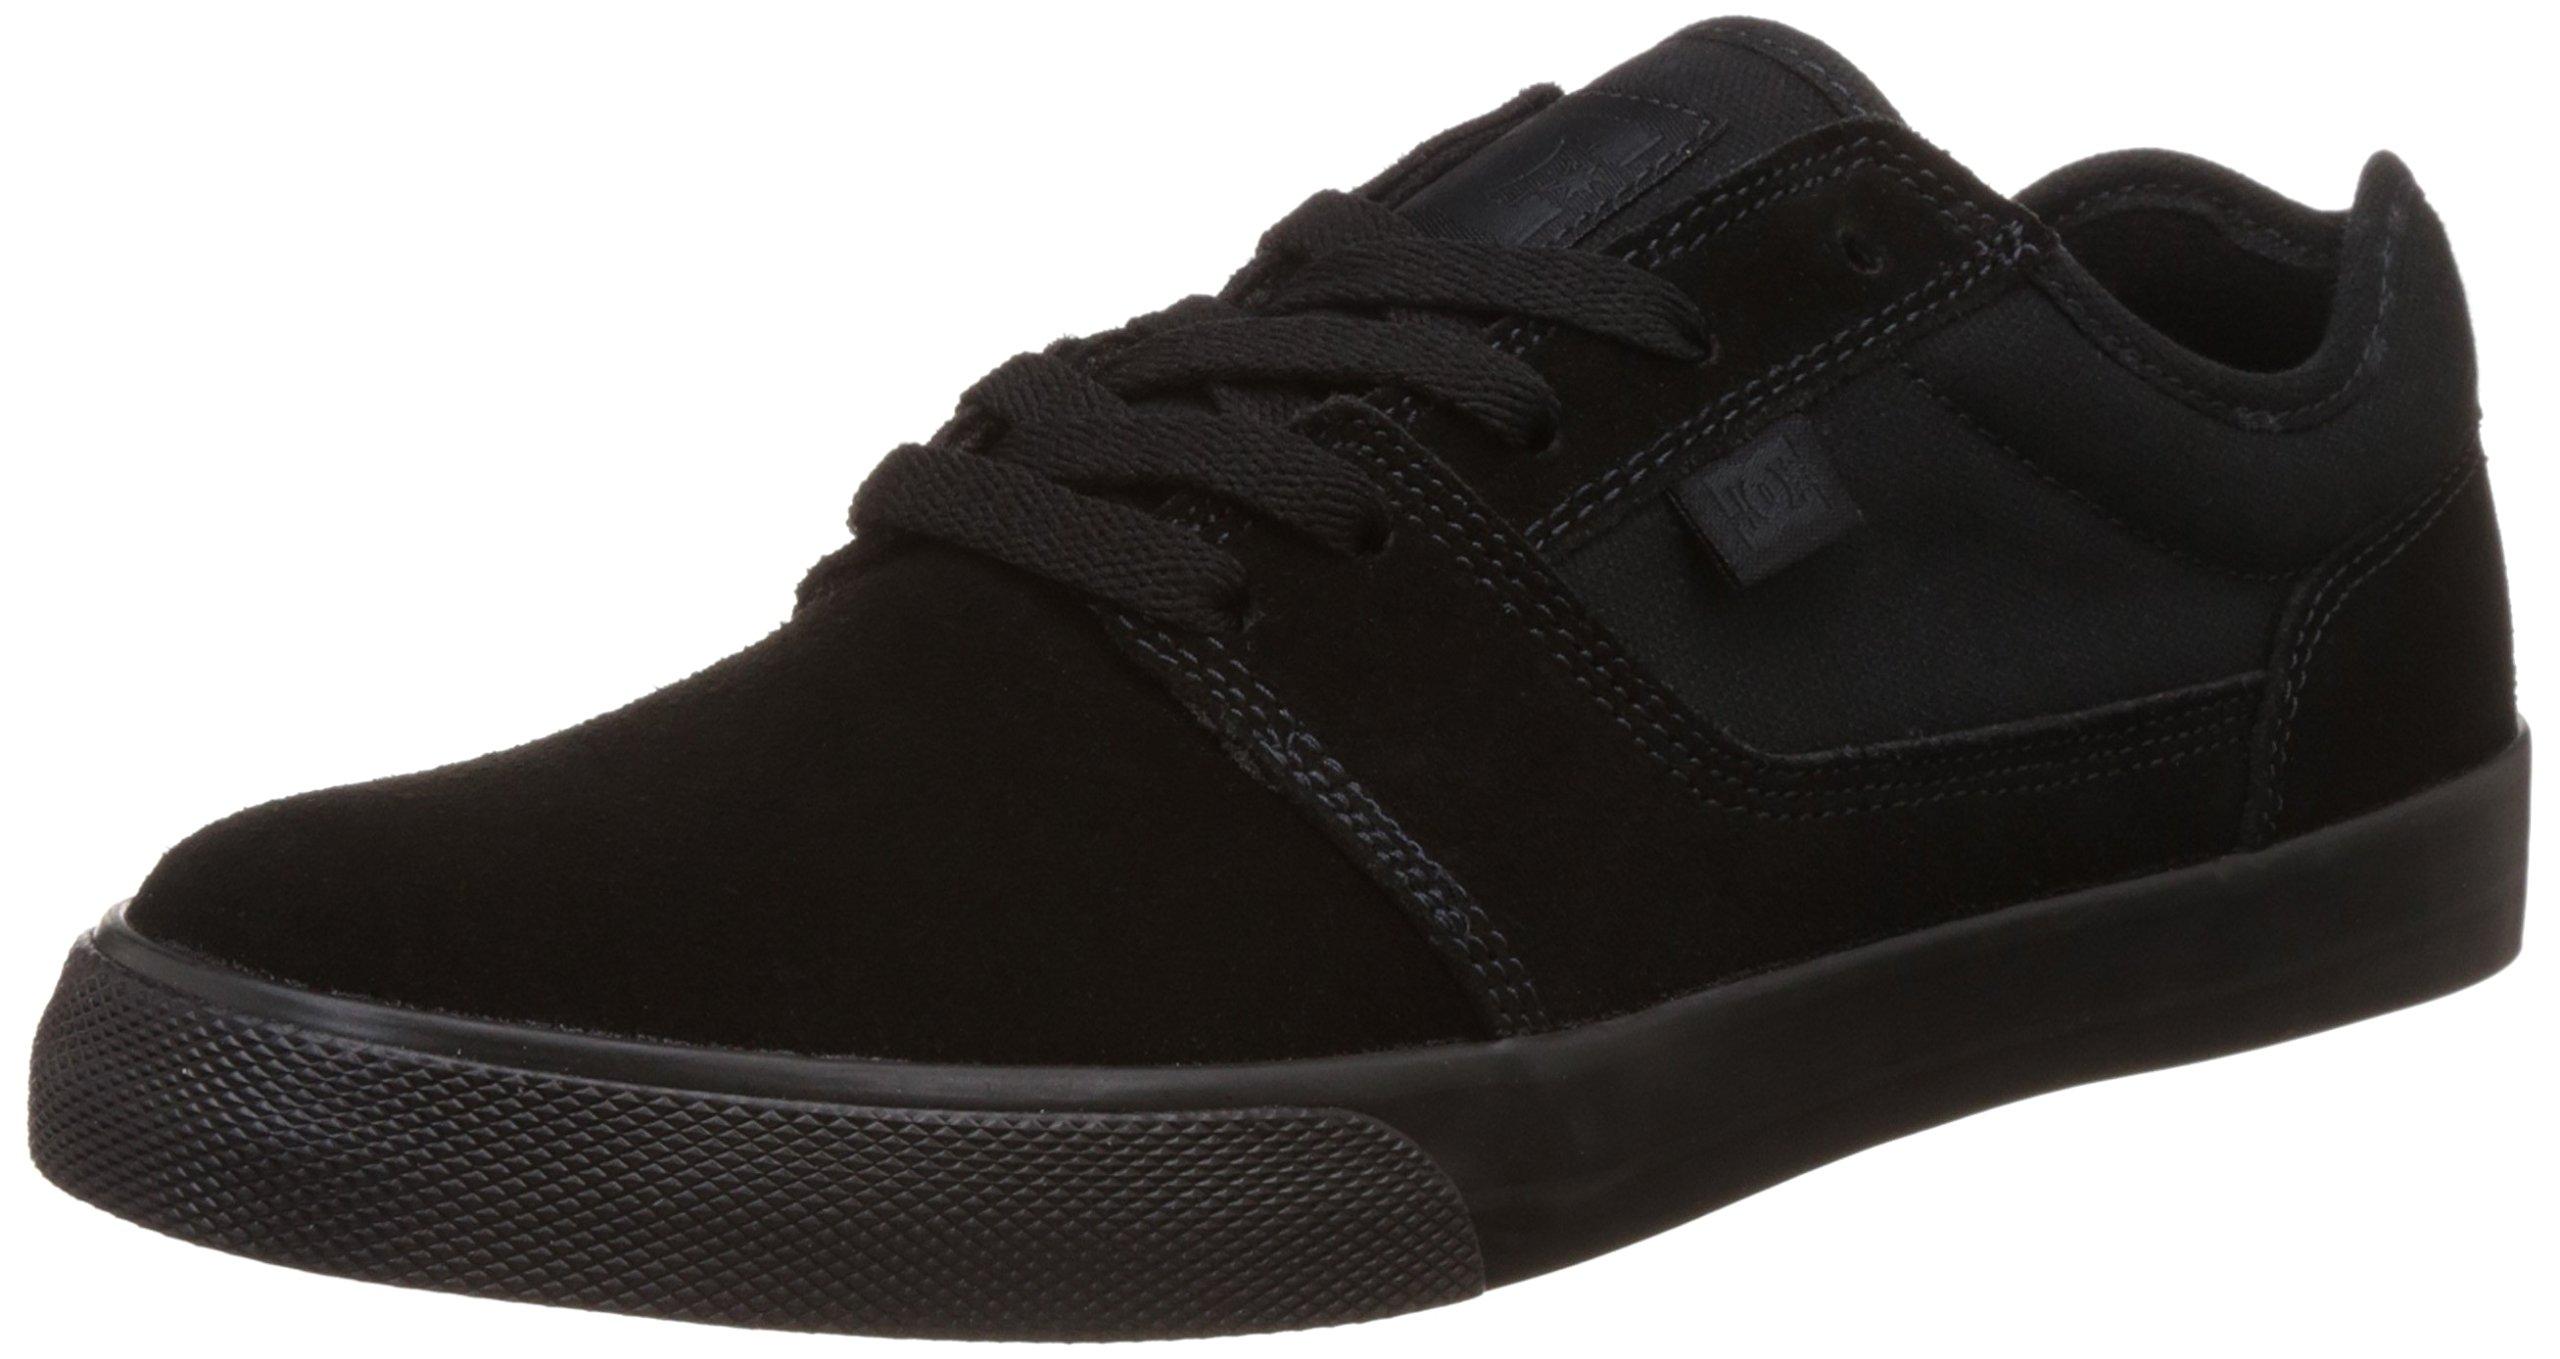 DC Men's TONIK Shoe, Black/Black, 7.5 D US